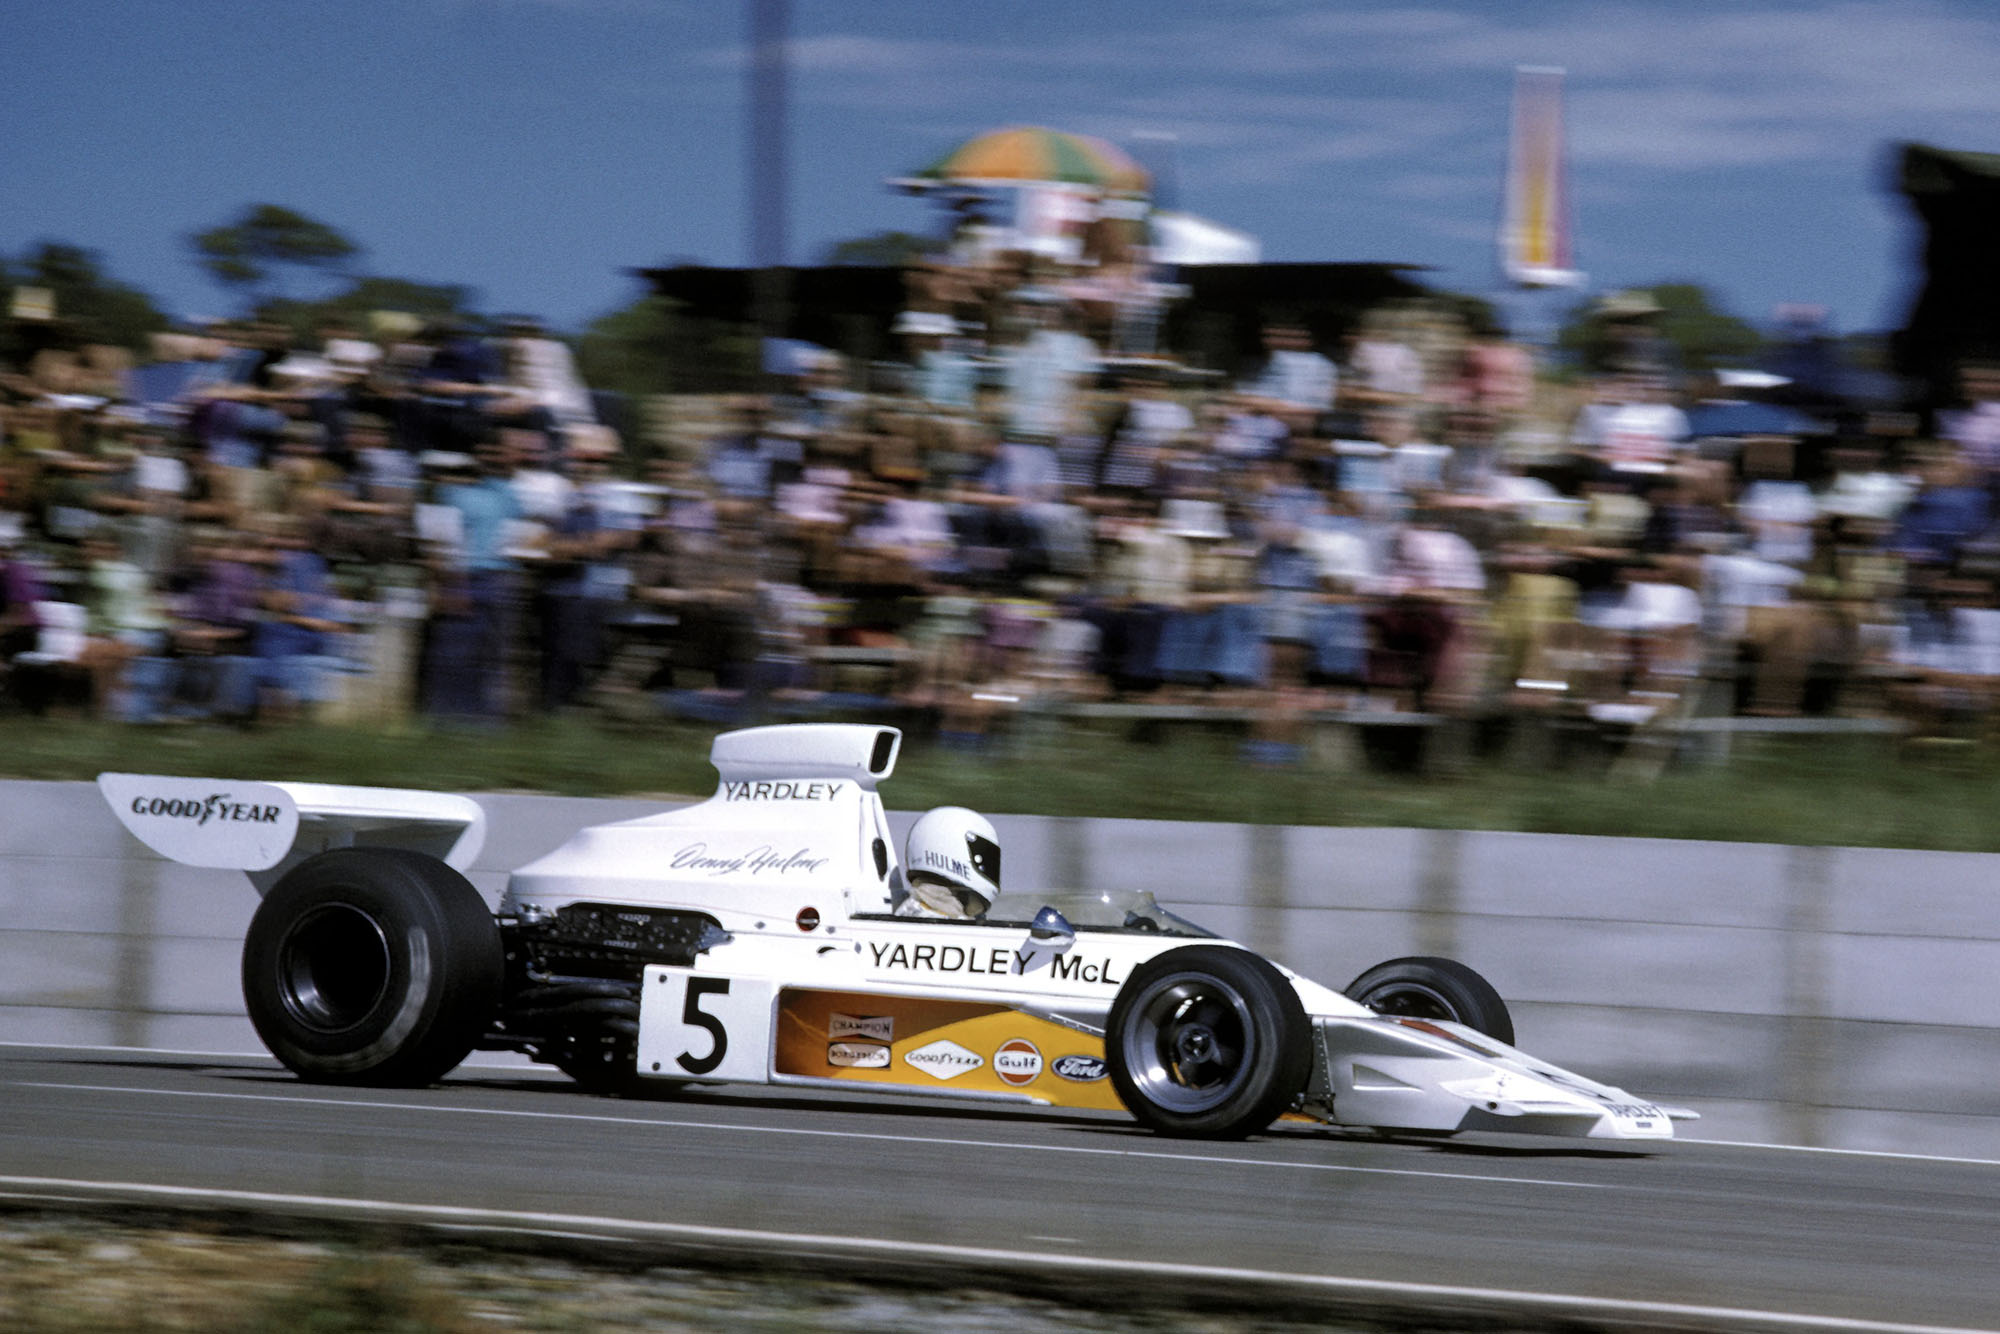 Denny Hulme (McLaren) driving at the 1973 South African Grand Prix, Kyalami.